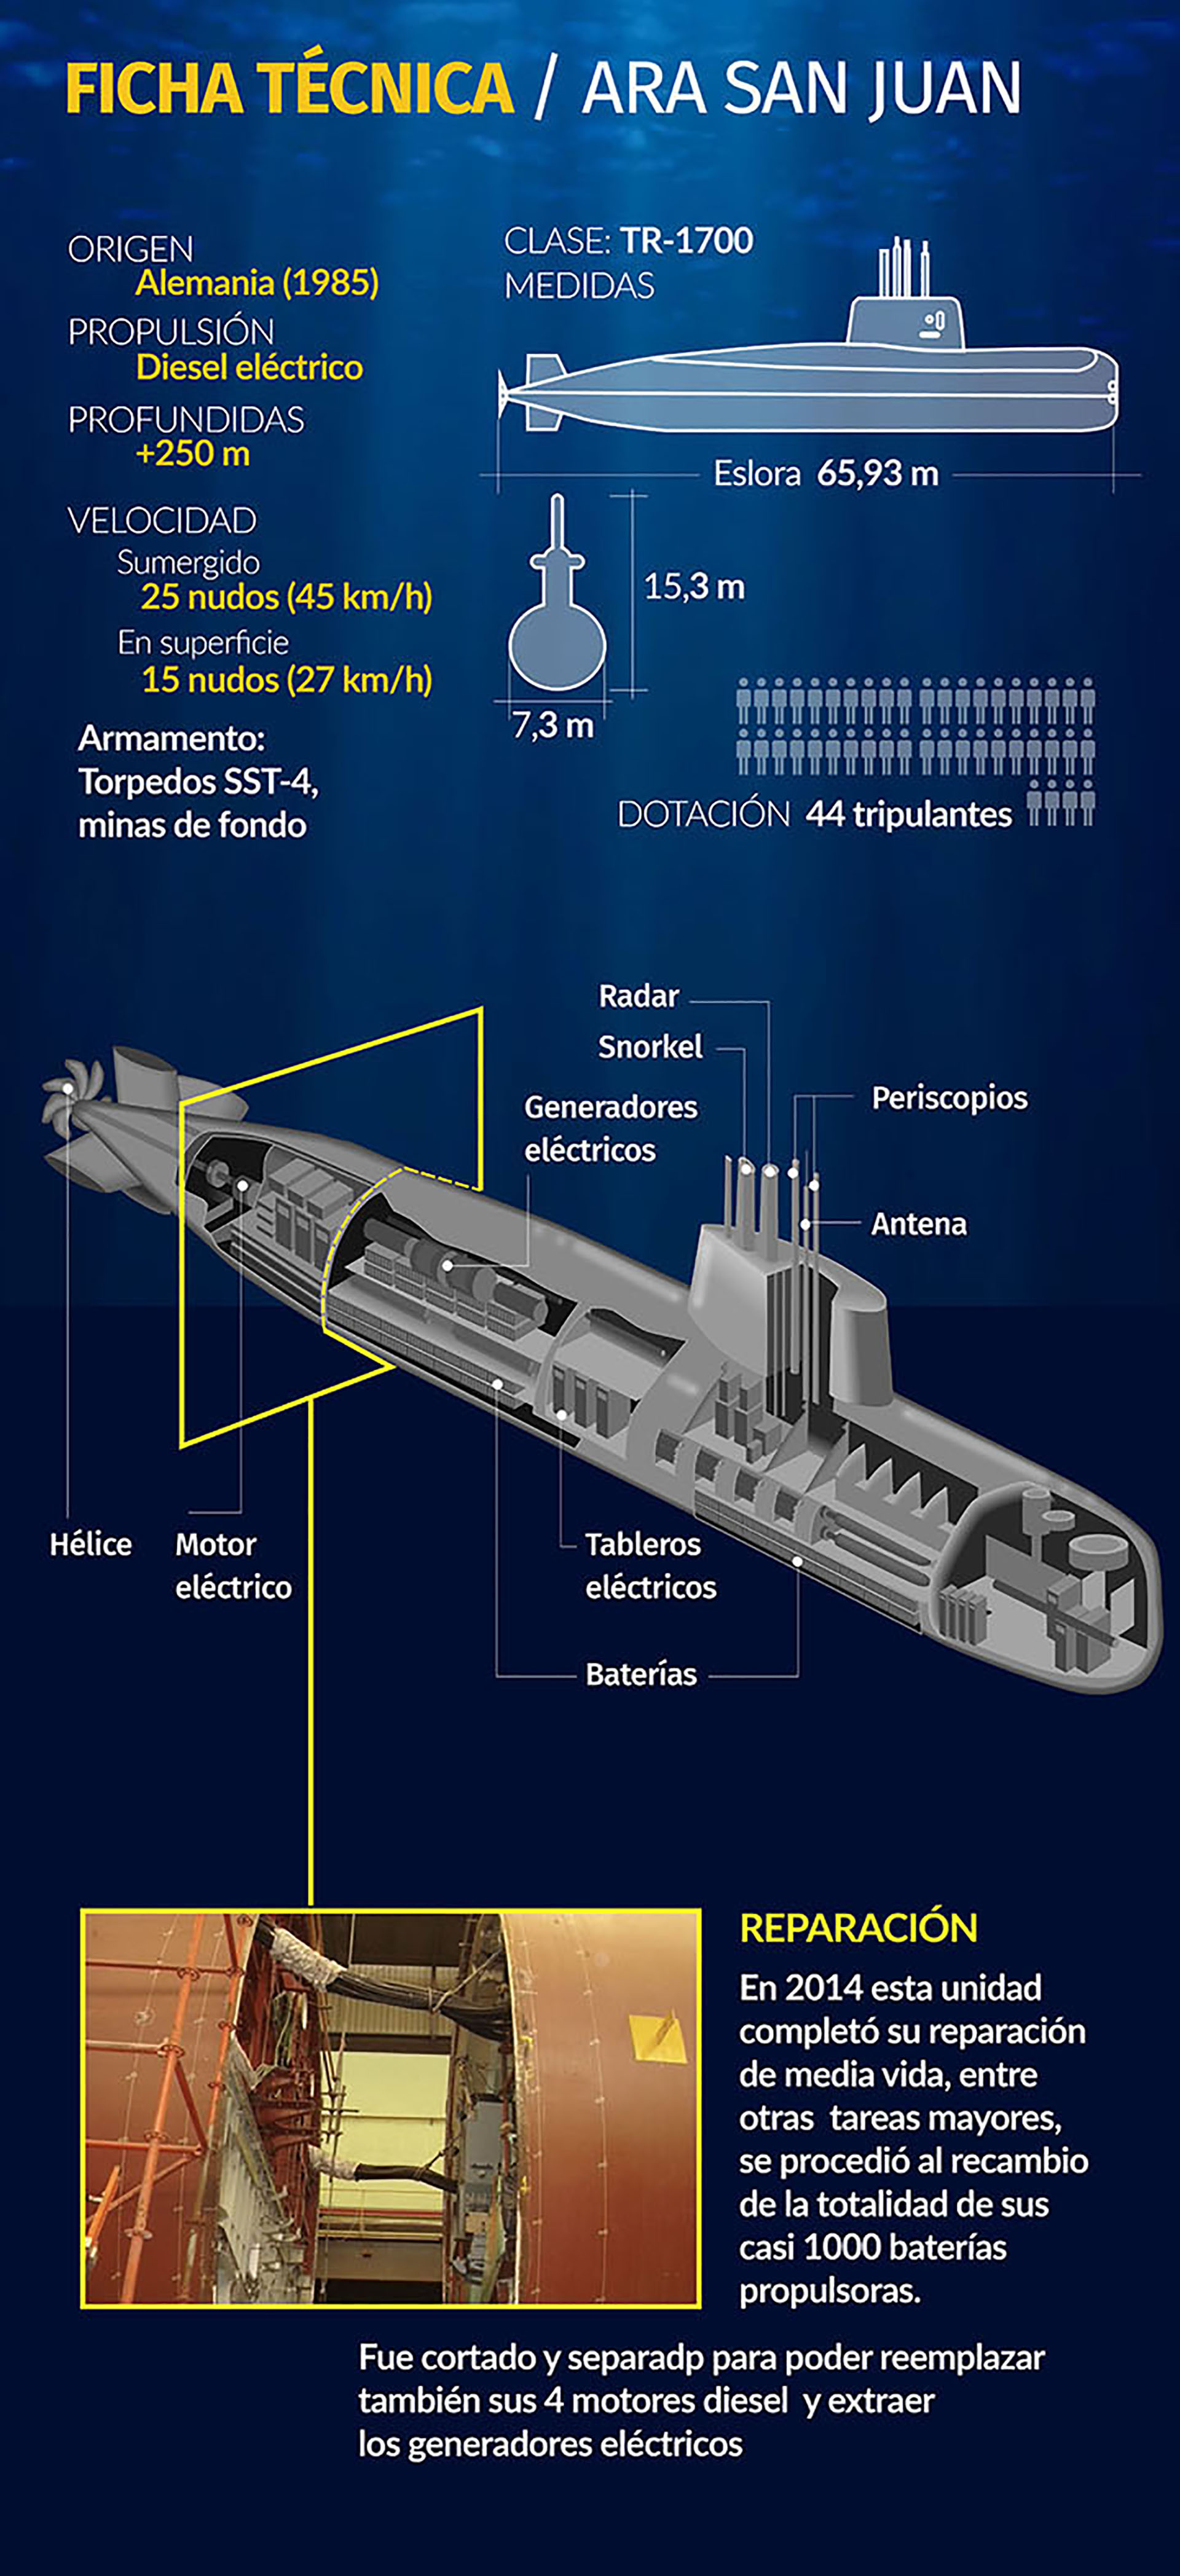 Submarino ARA San Juan ficha tecnica